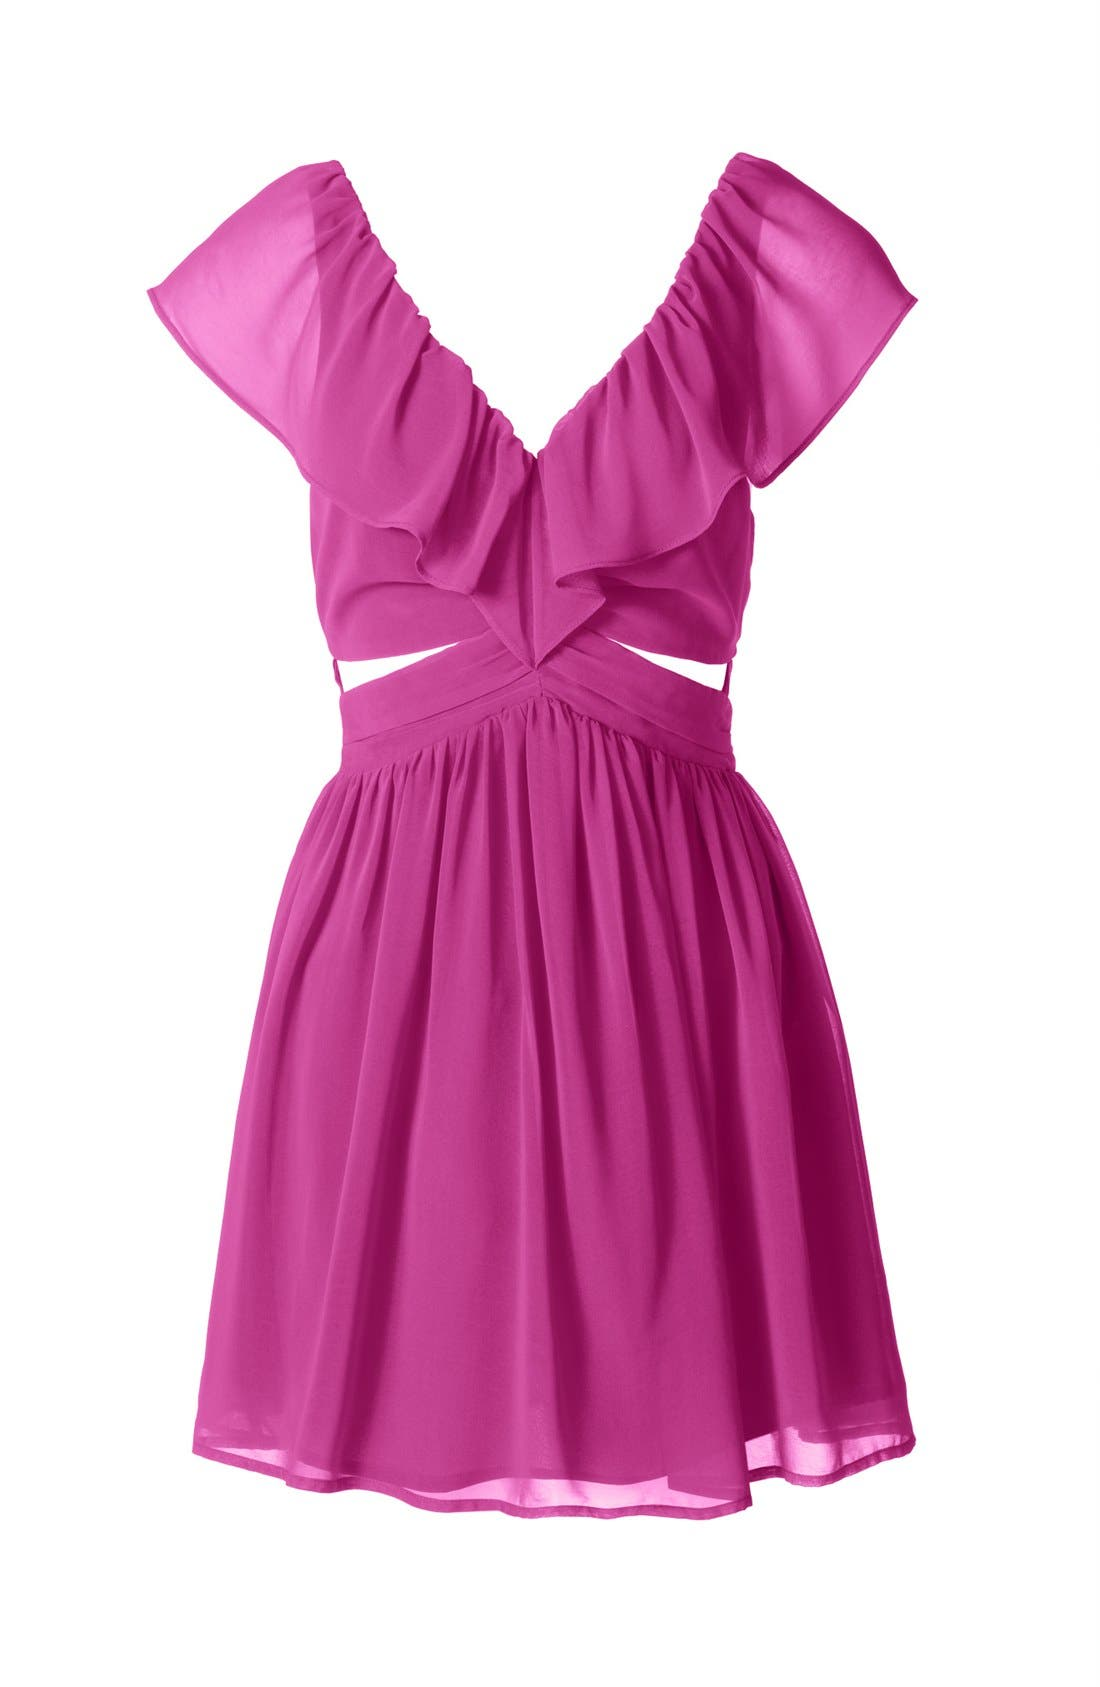 Alternate Image 3  - Keepsake the Label 'Lost Without You' Ruffled Mini Dress